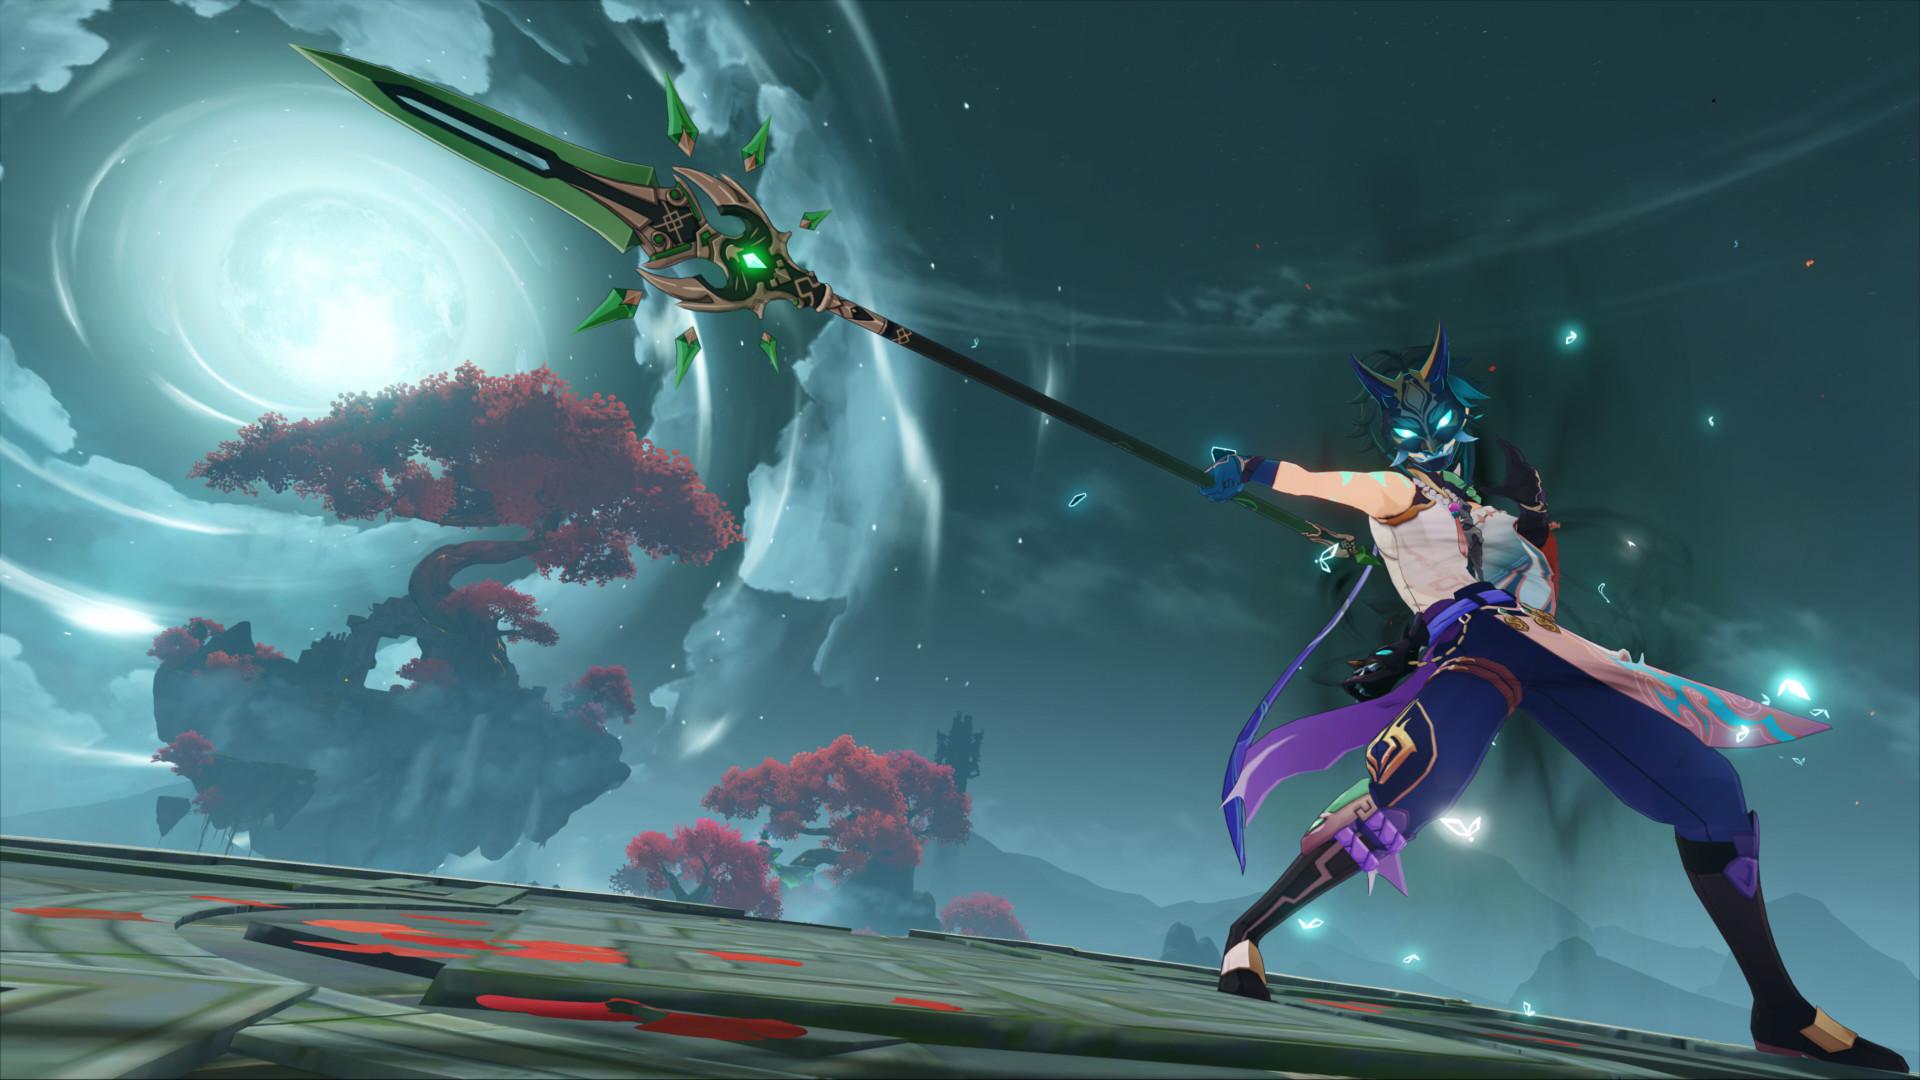 genshin-impact:-xiao-guide-—-weapons,-artifacts,-and-talents